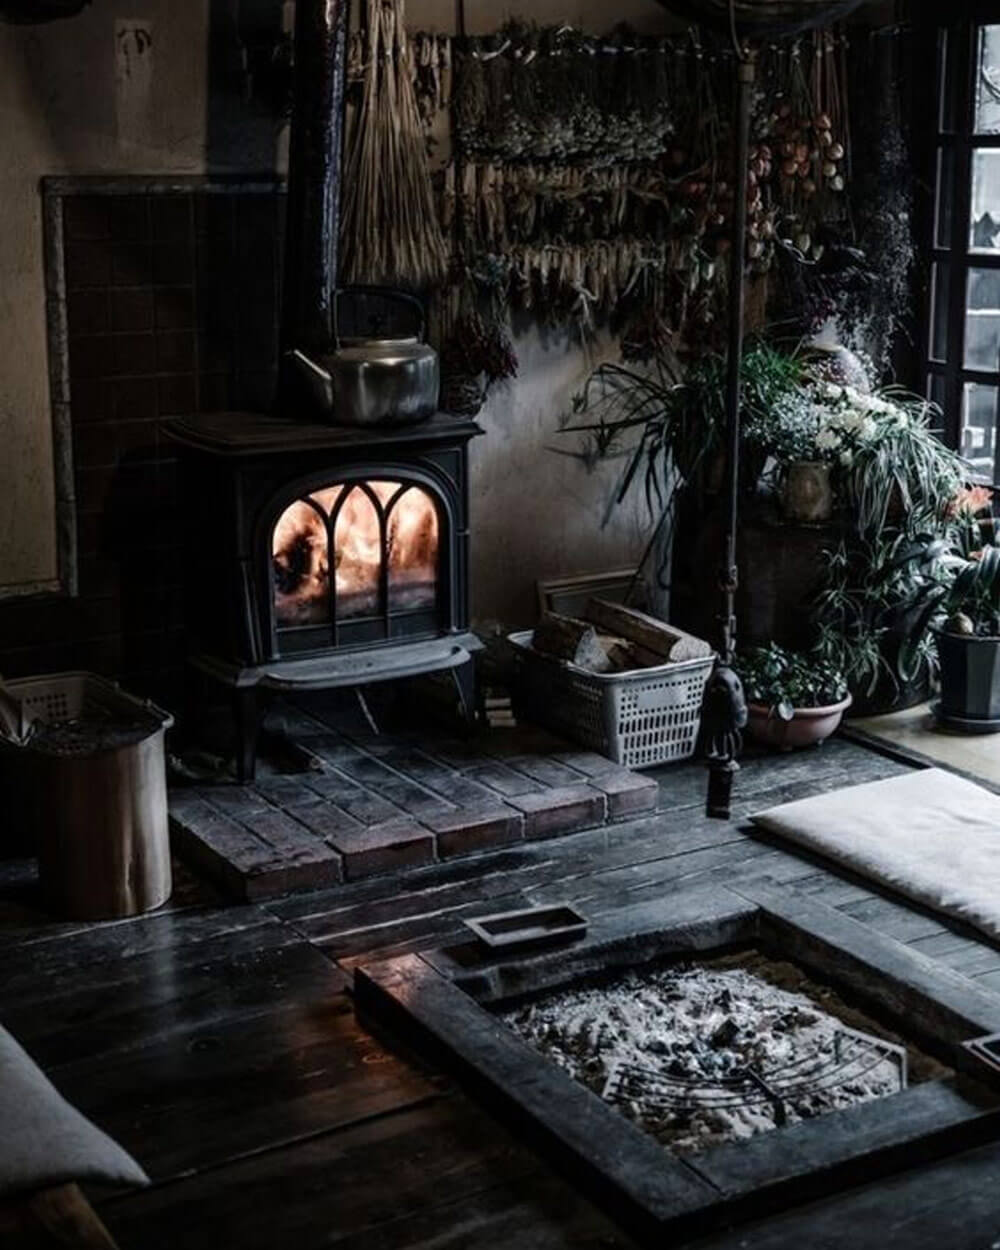 Dark Cottagecore aesthetics